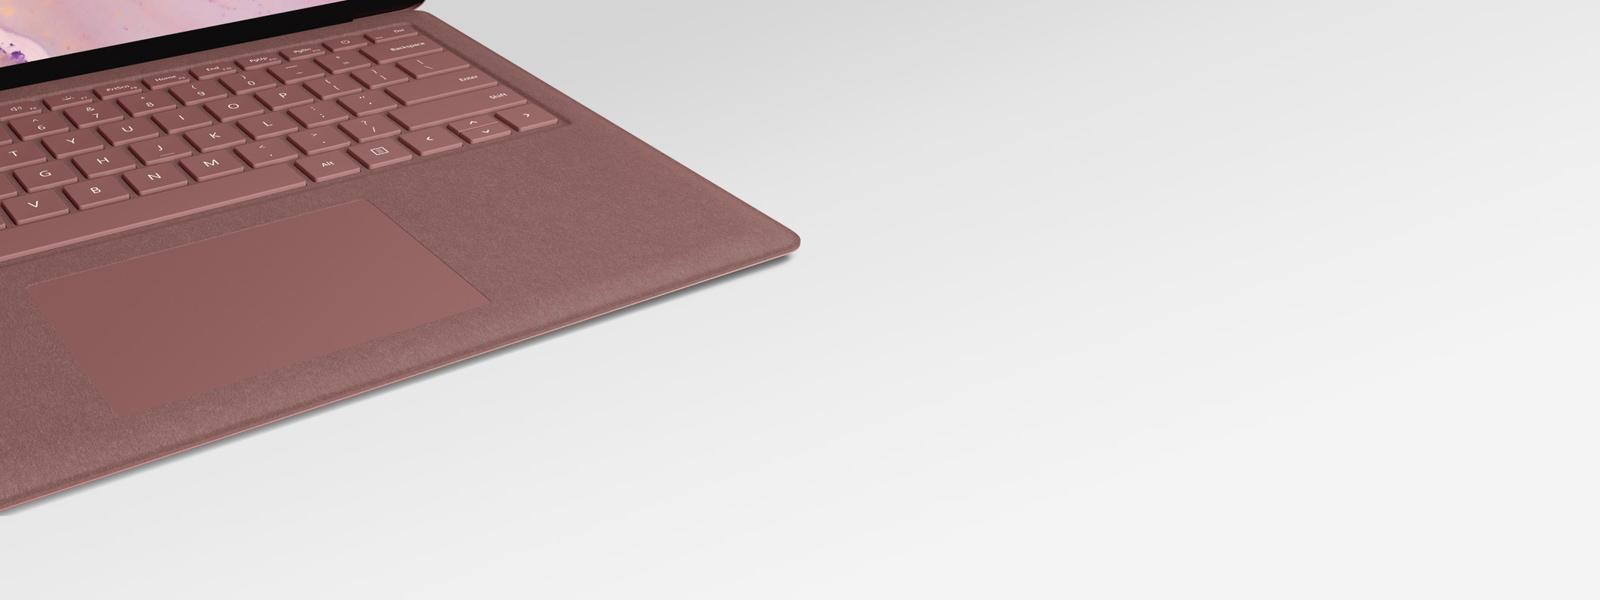 Surface Laptop 2 键盘和触控板